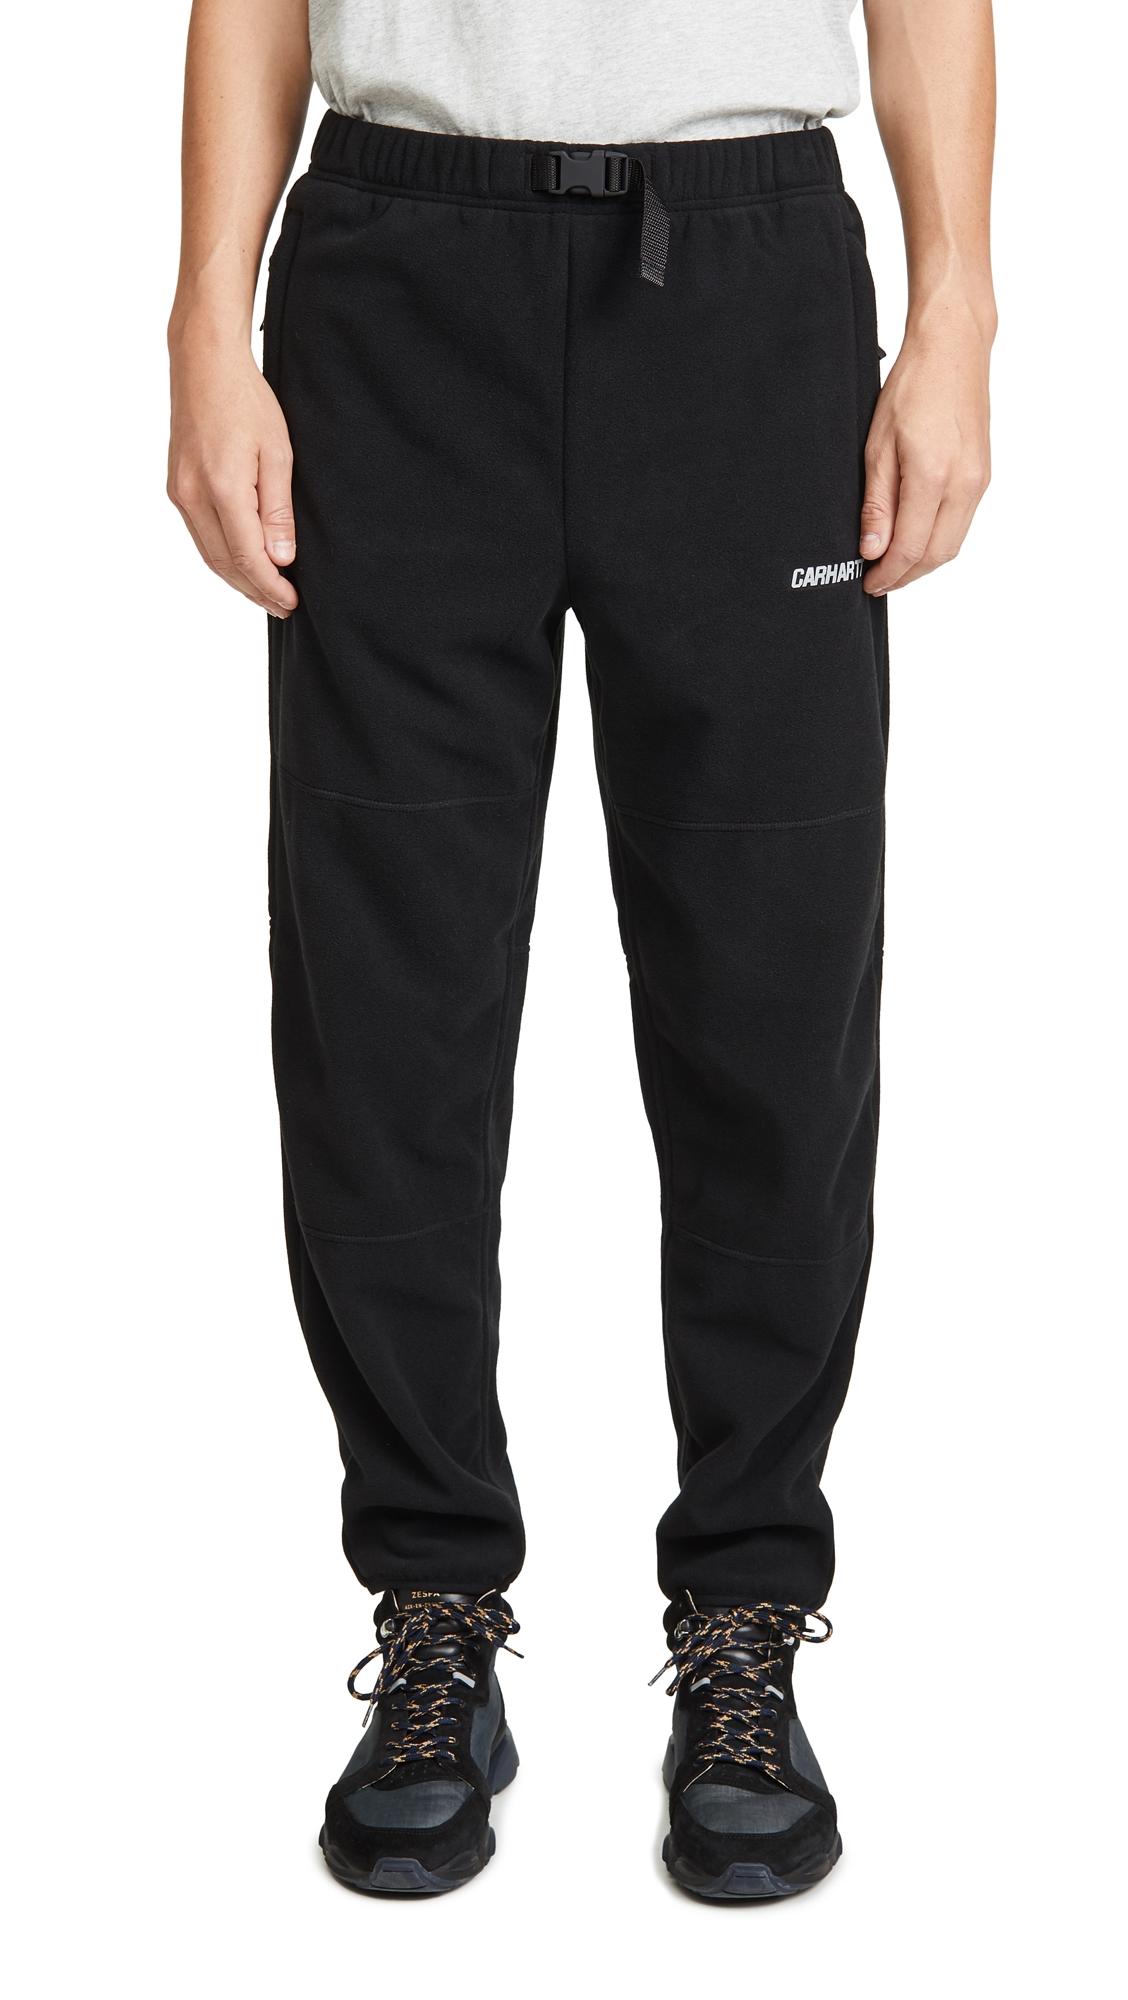 Carhartt pants sale wayfair mirrors